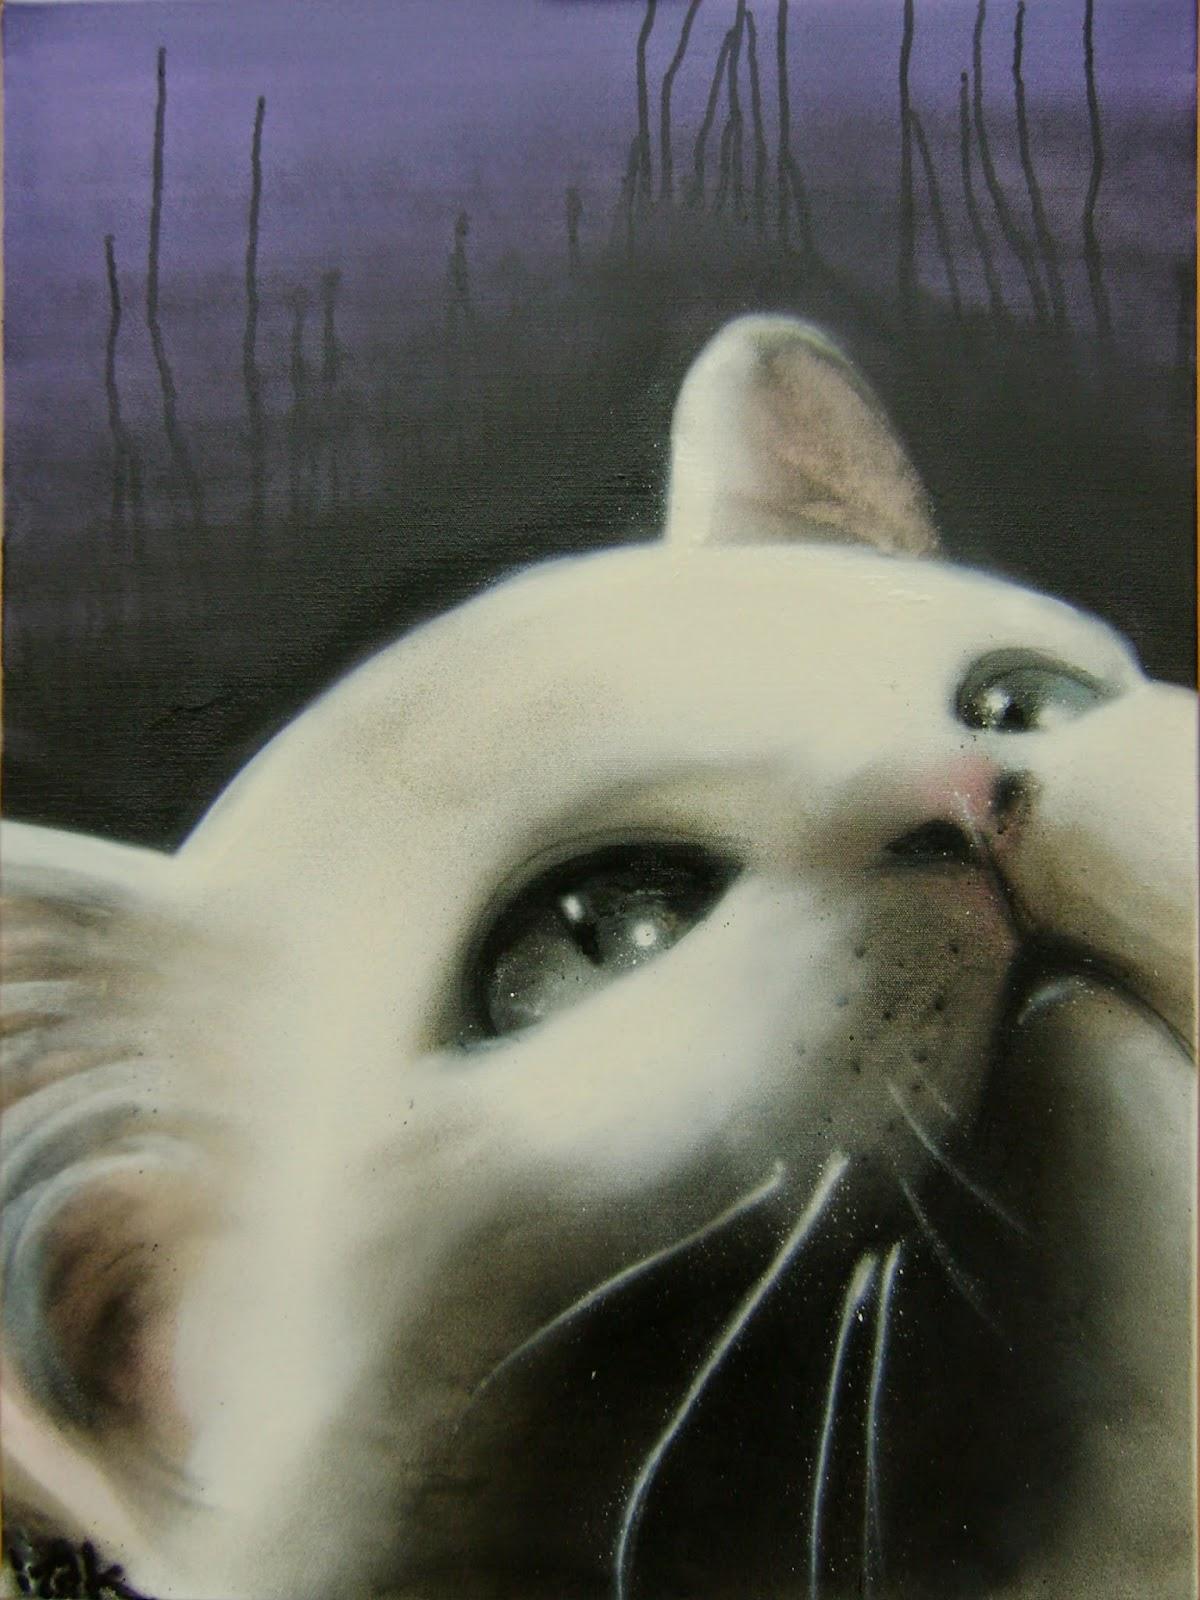 izak izakone graffiti artist art streetart canvas 2008 cat